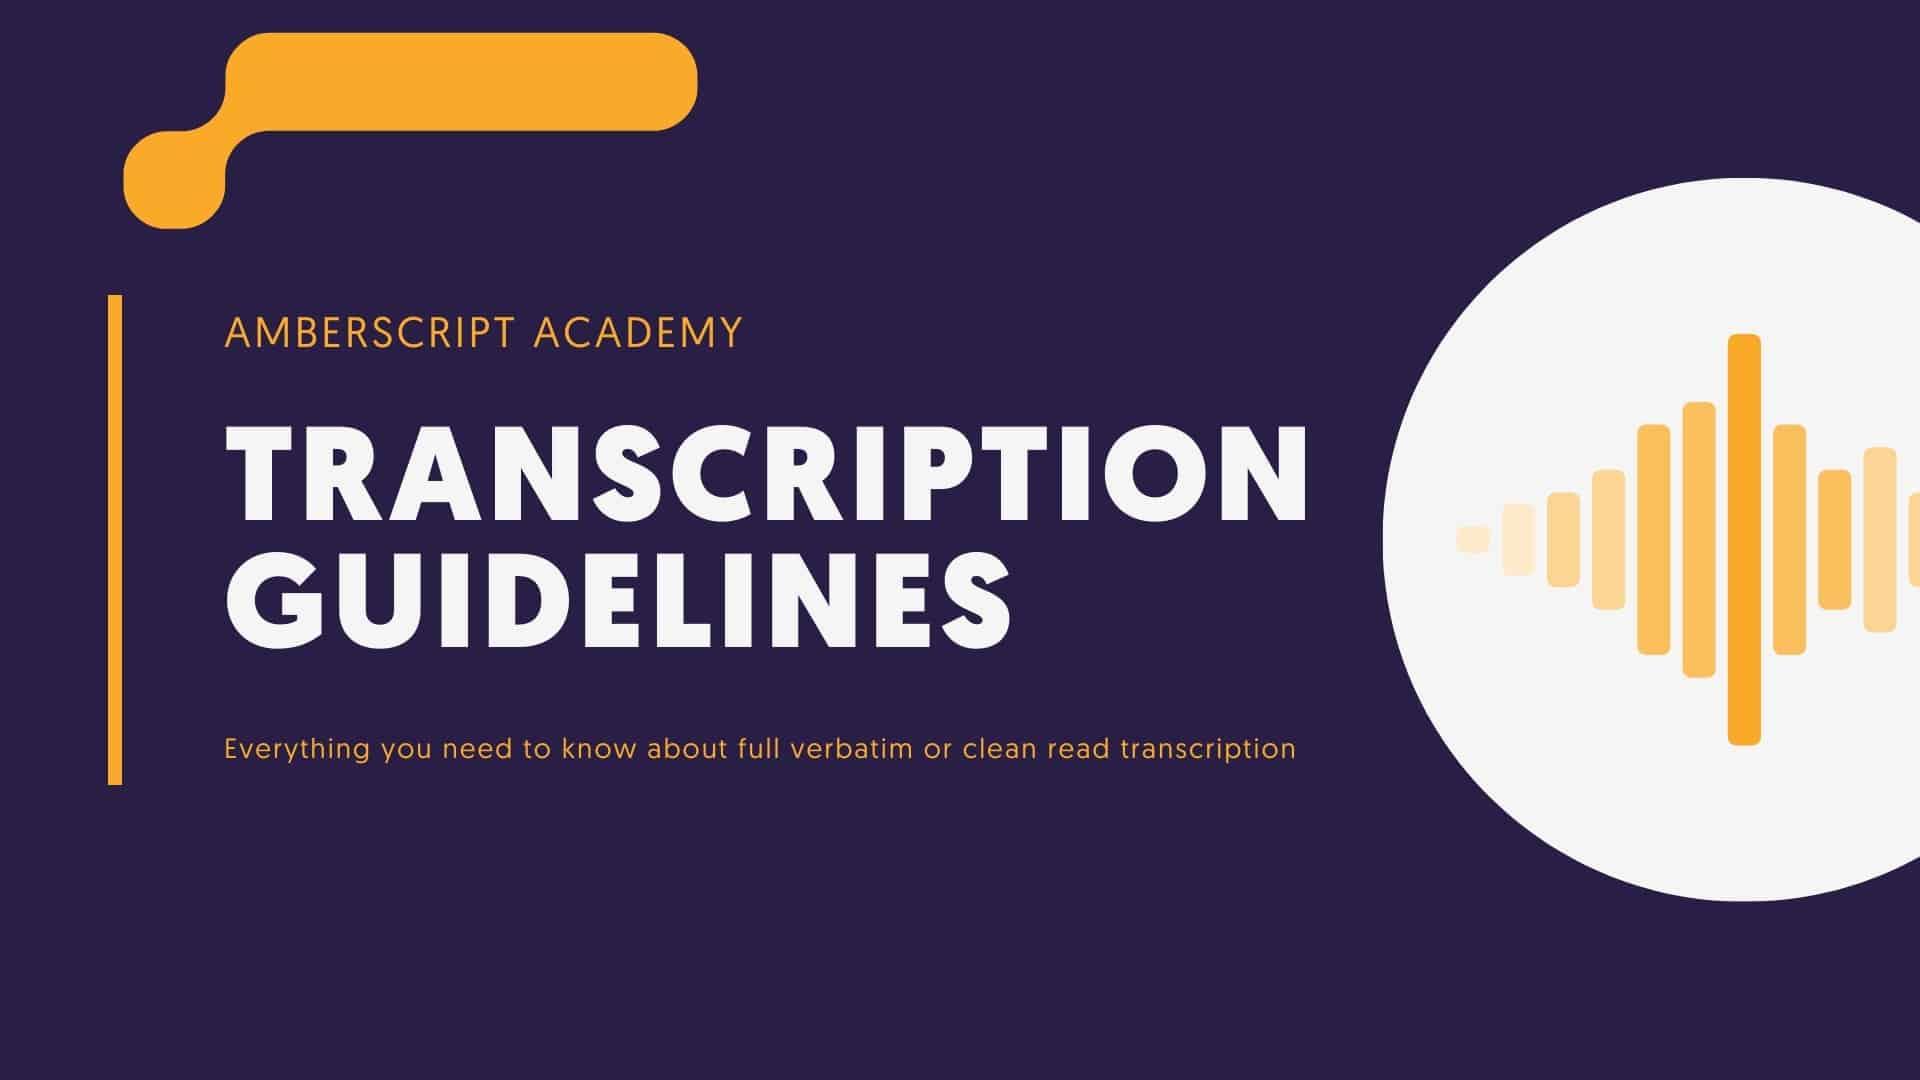 Amberscript Academy Transcription Guidelines